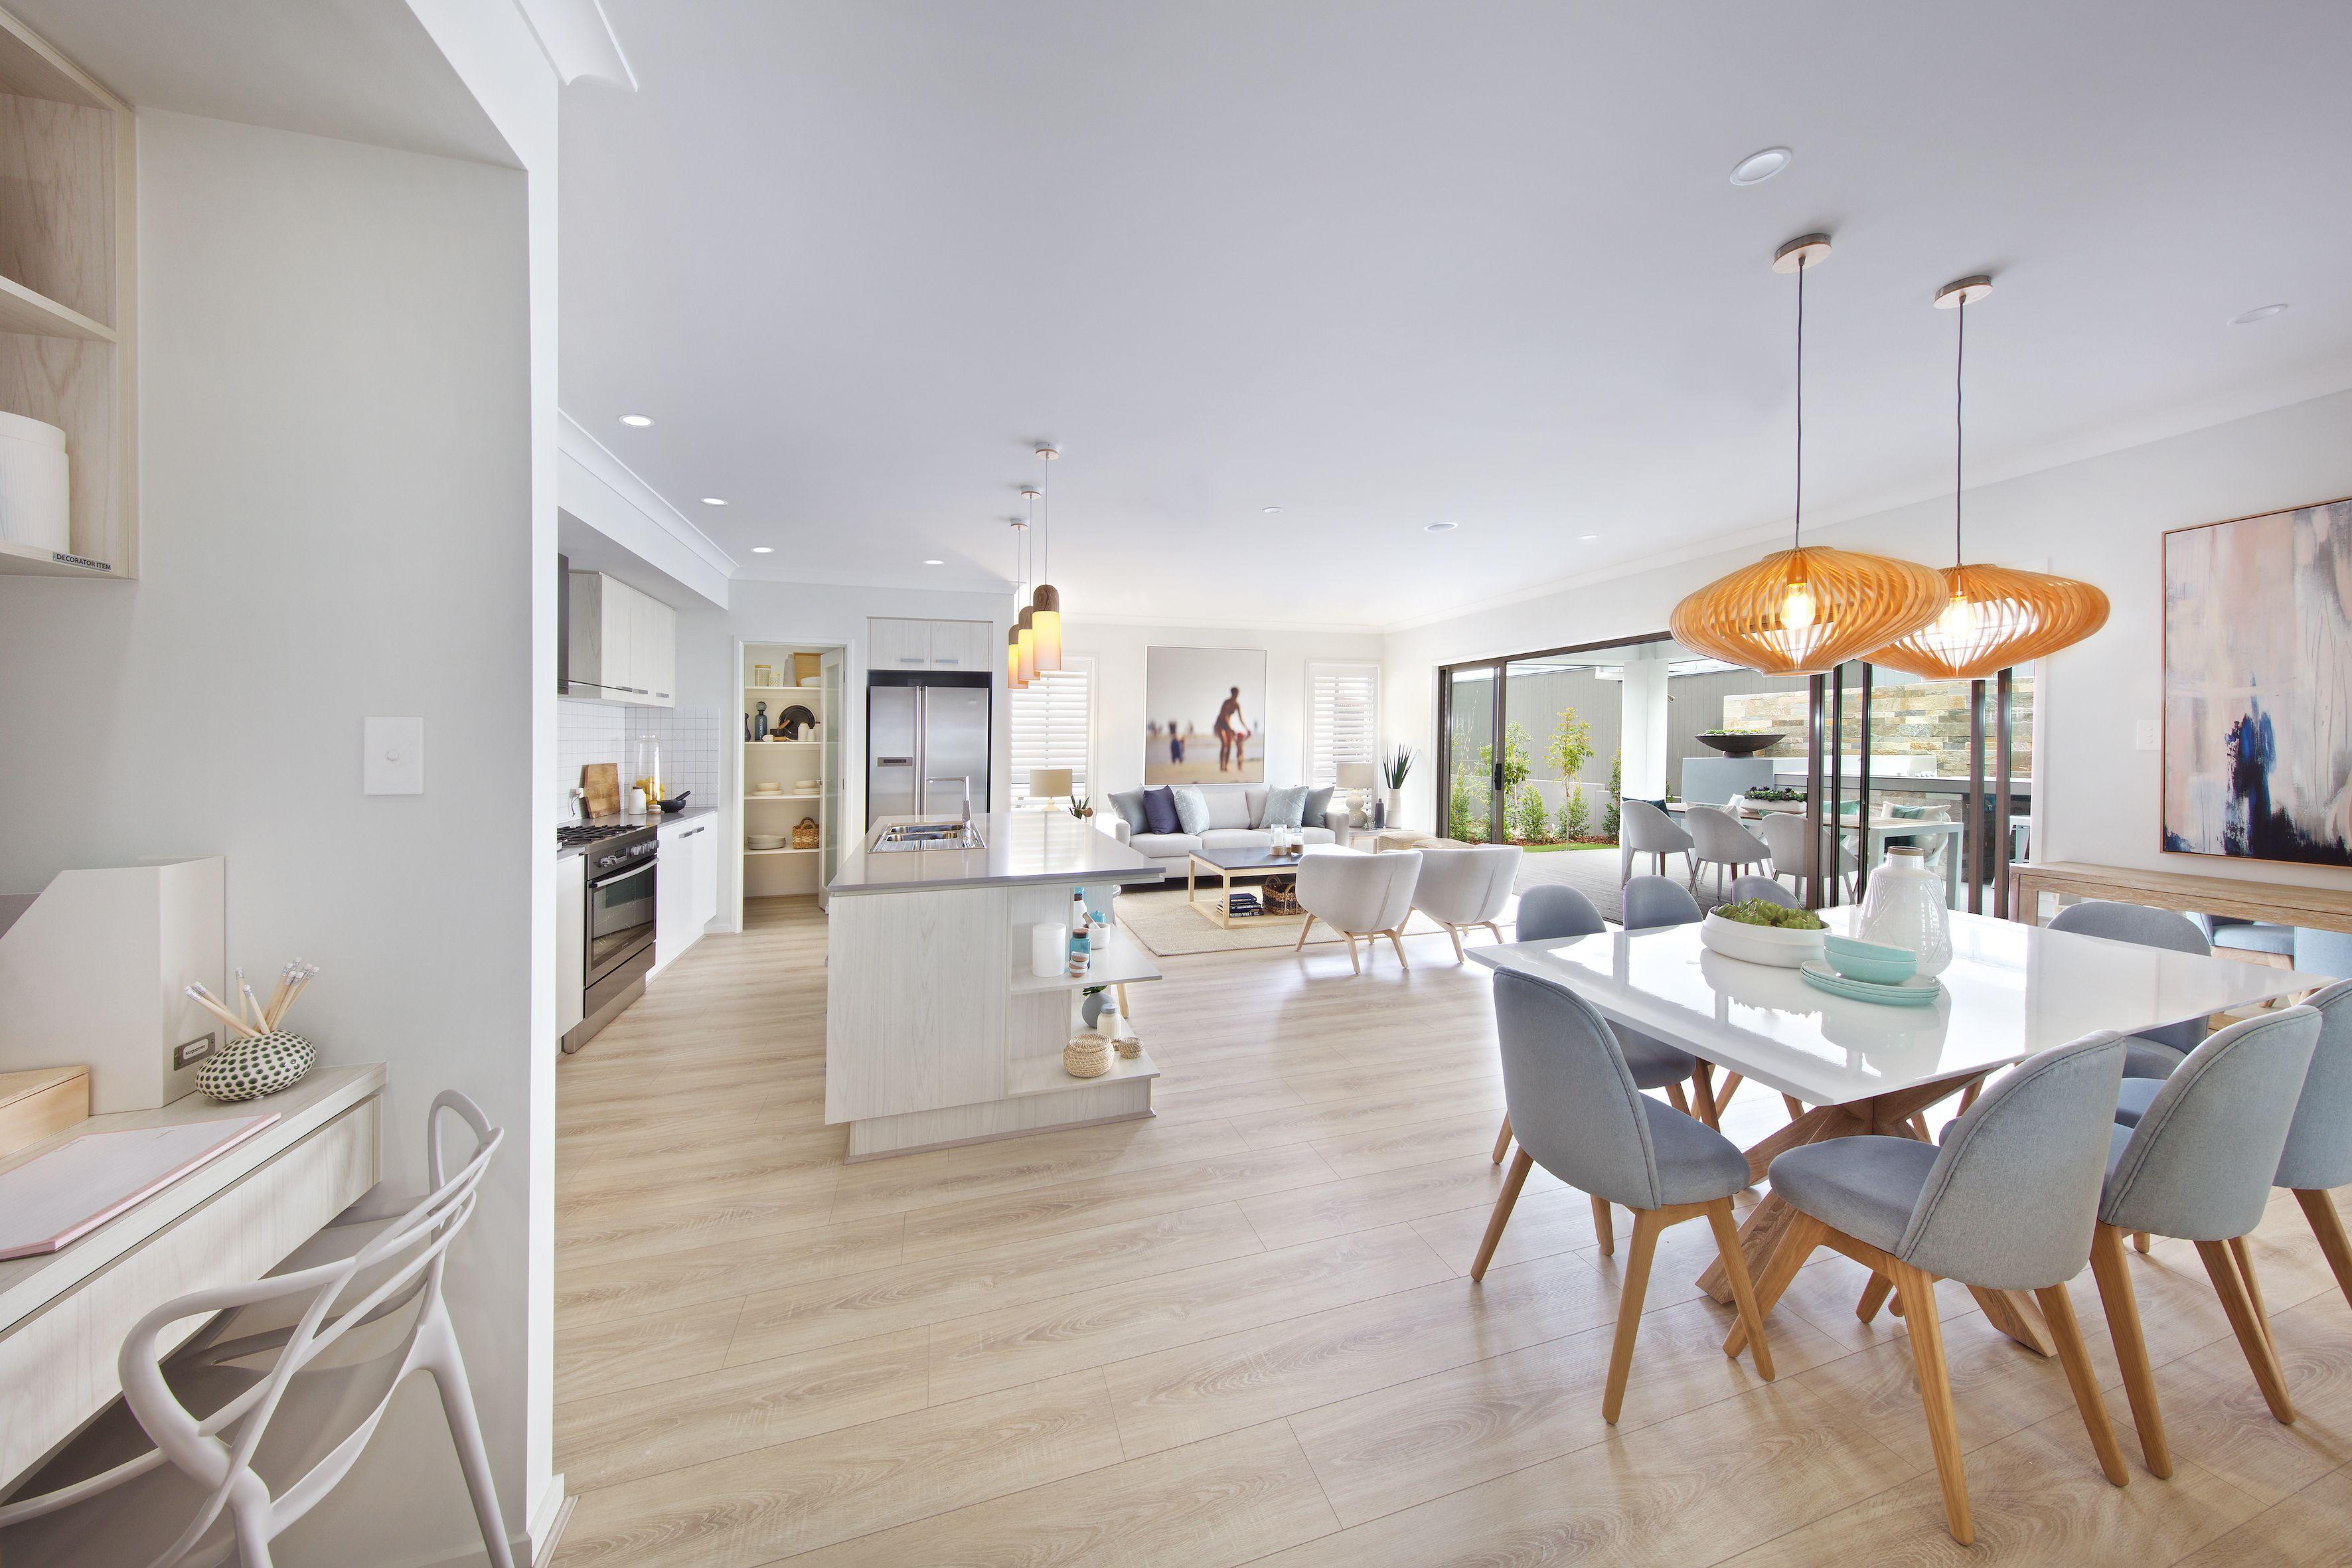 Clarendon Homes Brighton 30 Open plan living with hampton s